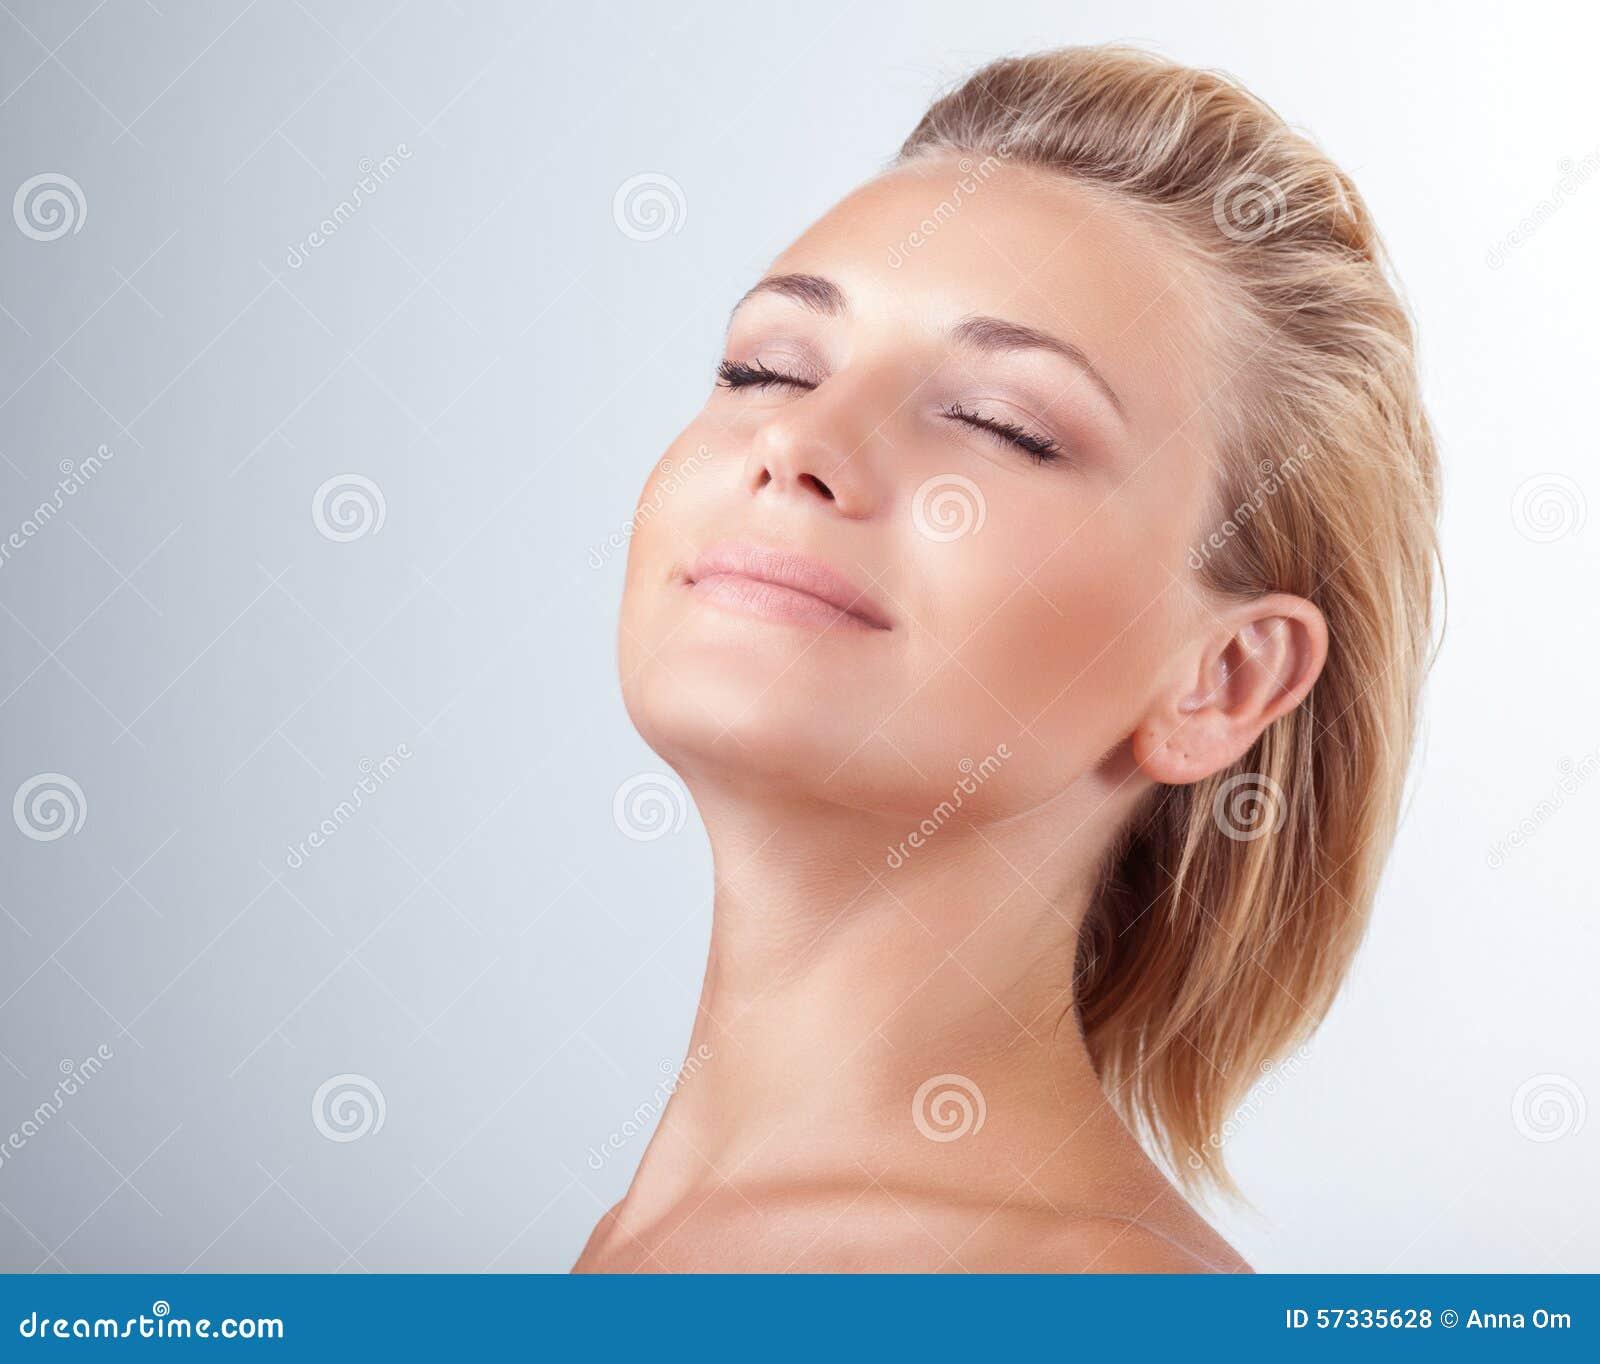 Woman Enjoying At Beach Stock Image Image Of Pleasure: Satisfied Woman At Spa Stock Photo